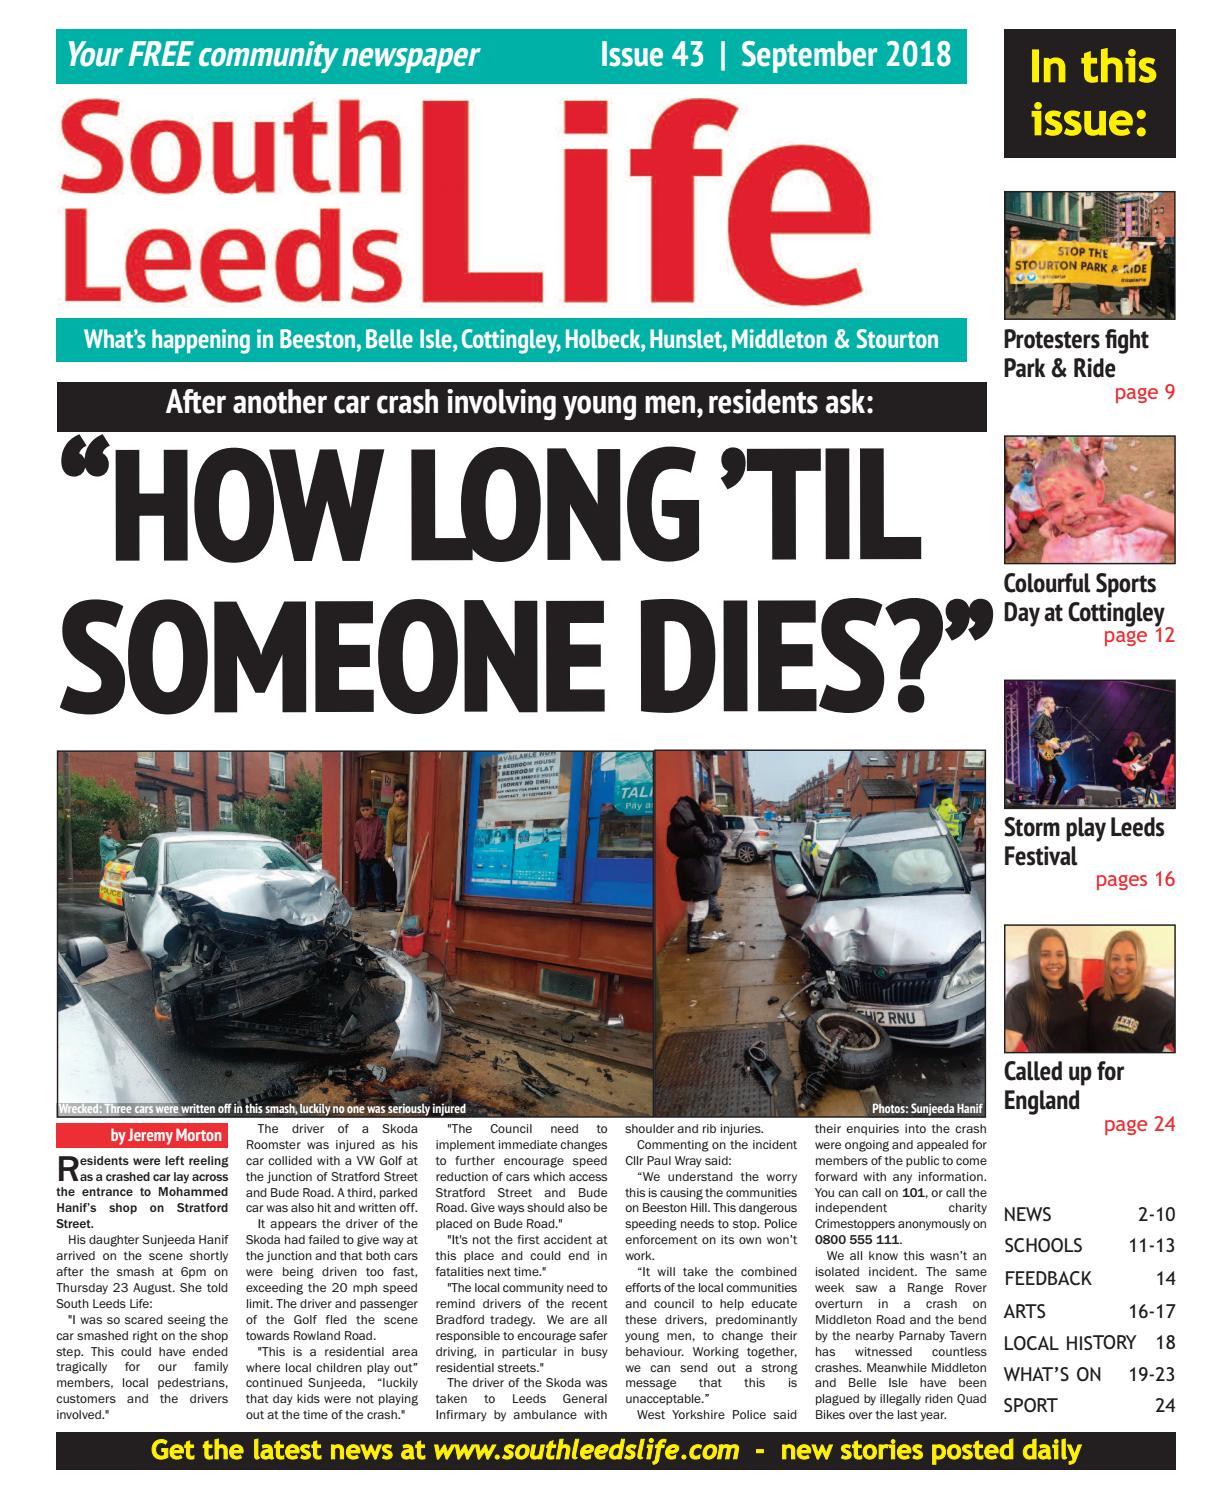 South Leeds Life 43 September 2018 by South Leeds Life - issuu